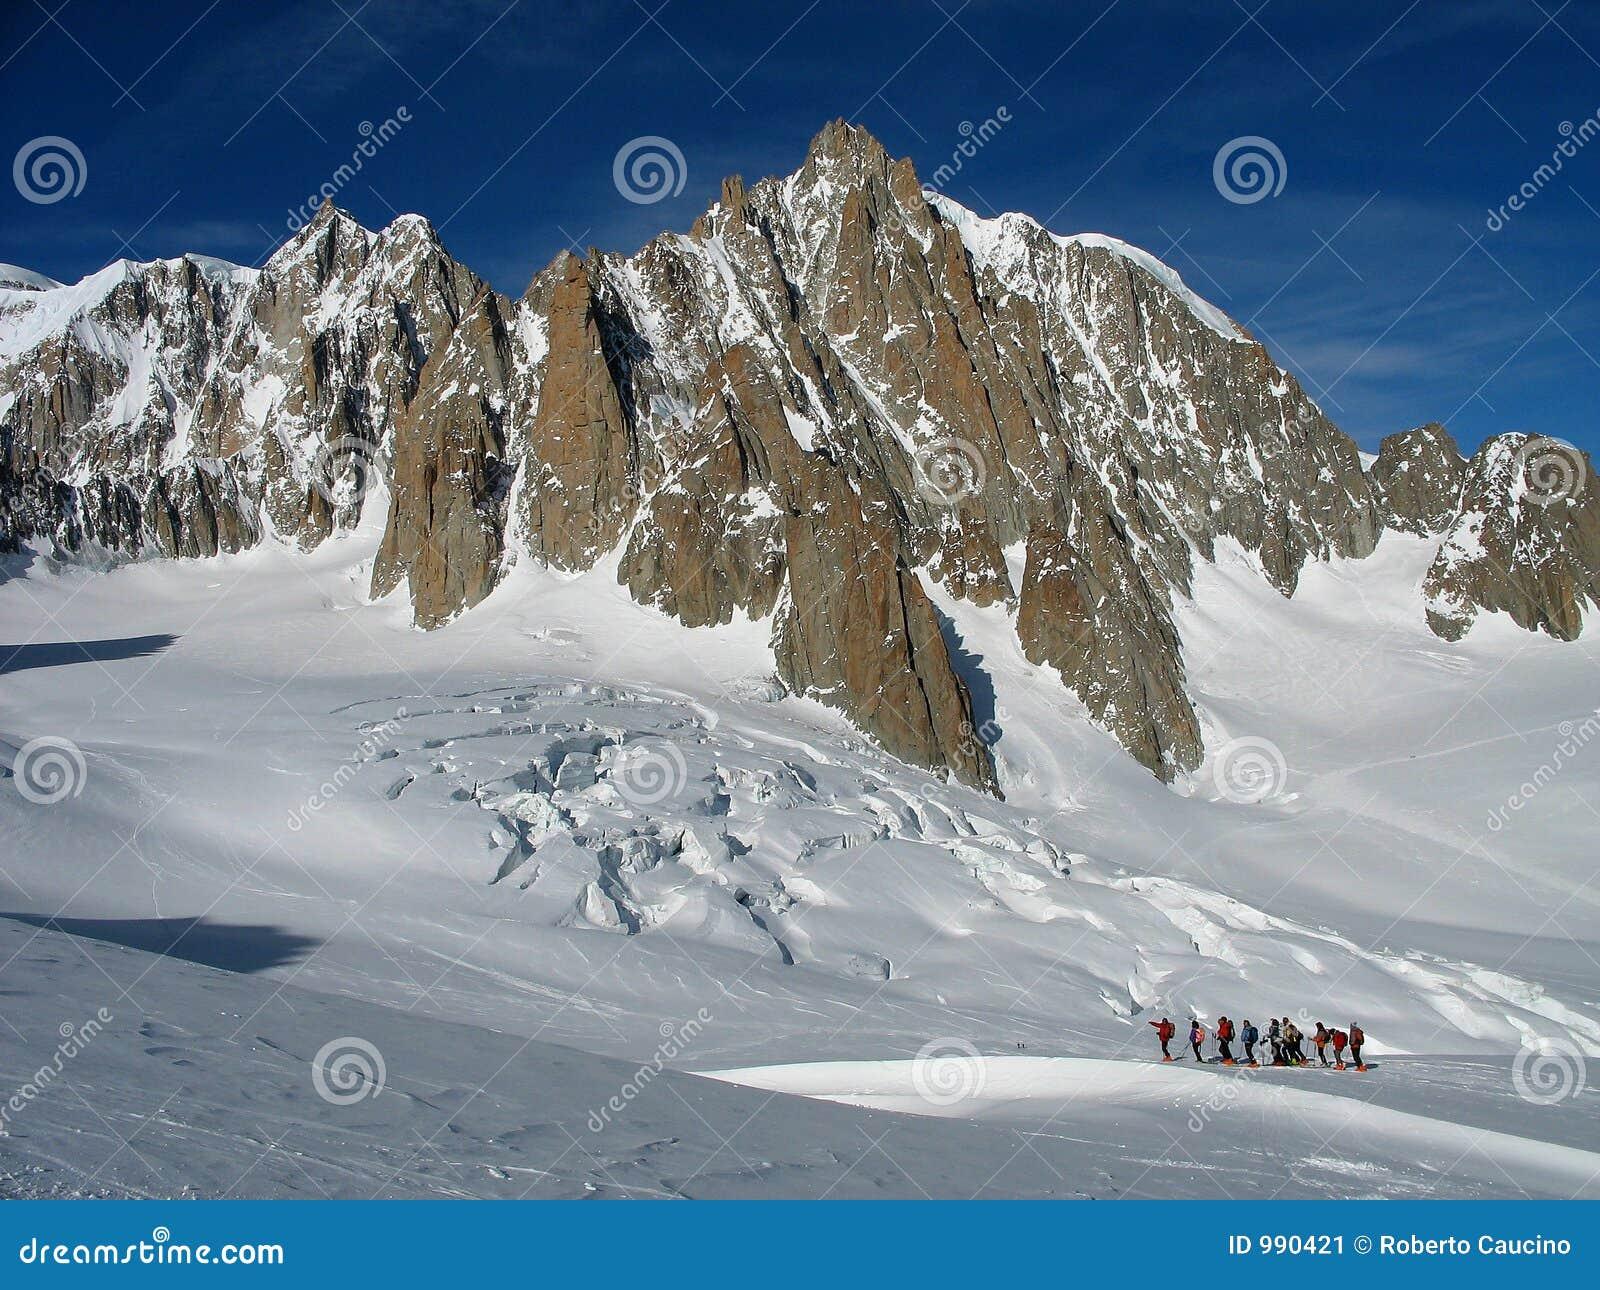 Skitouring backcountry